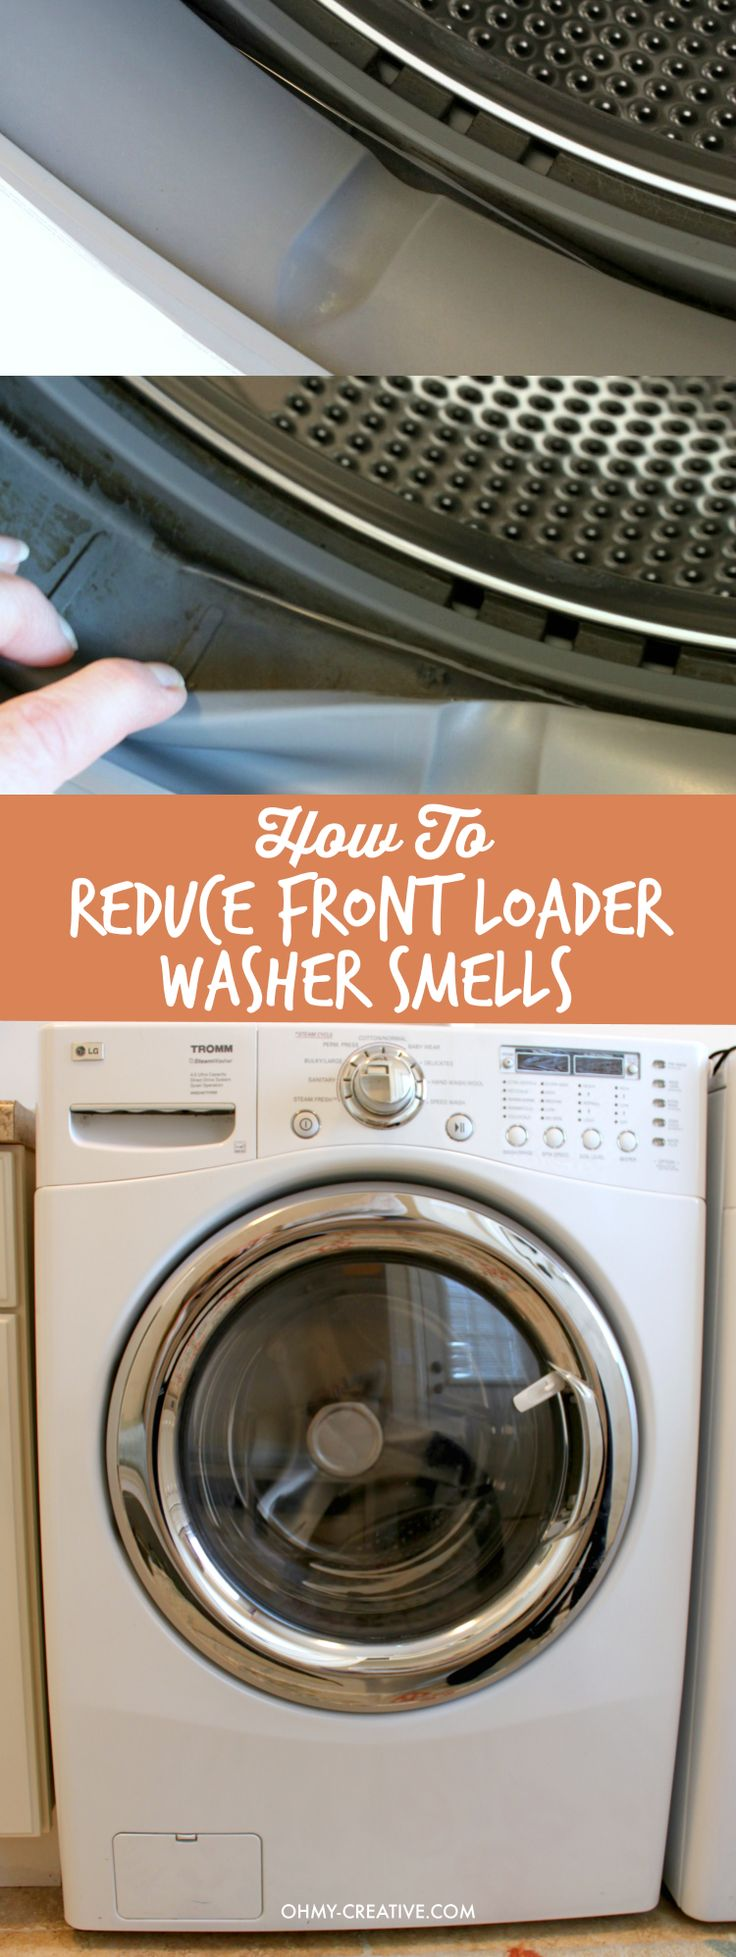 diy front loader washing machine cleaner